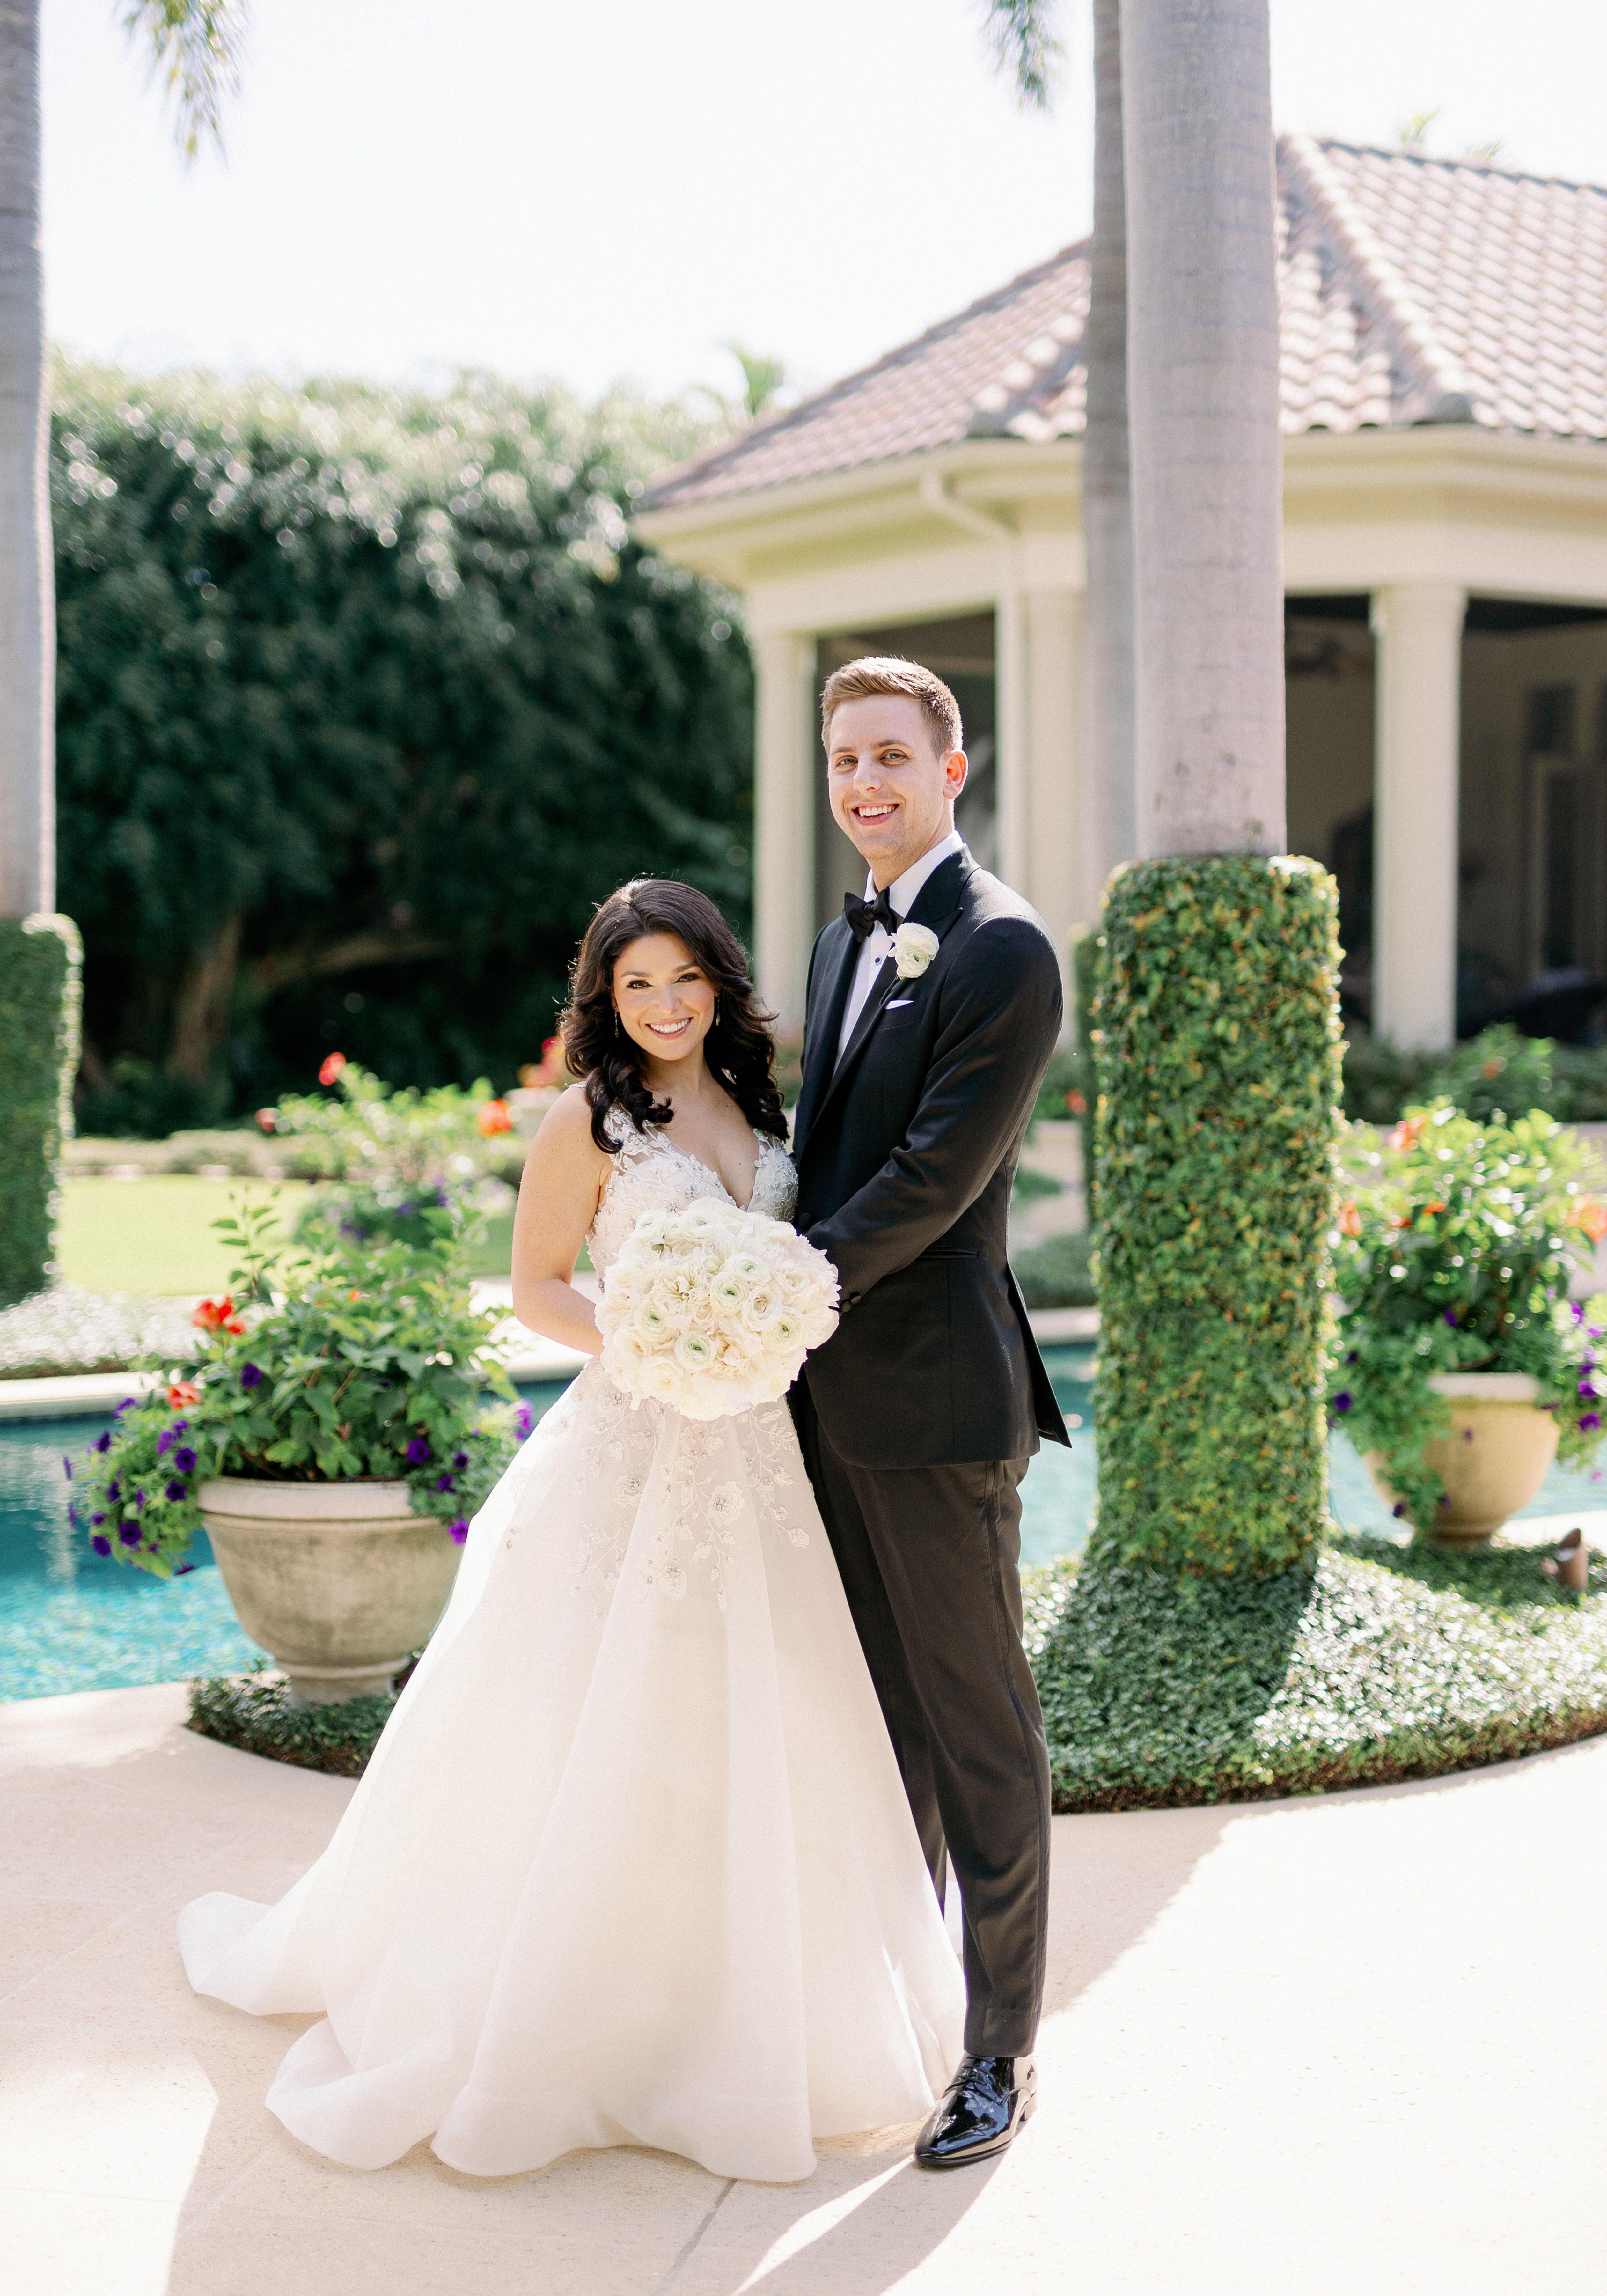 Bride And Groom In 2020 Destination Wedding Destination Wedding Planner Bride